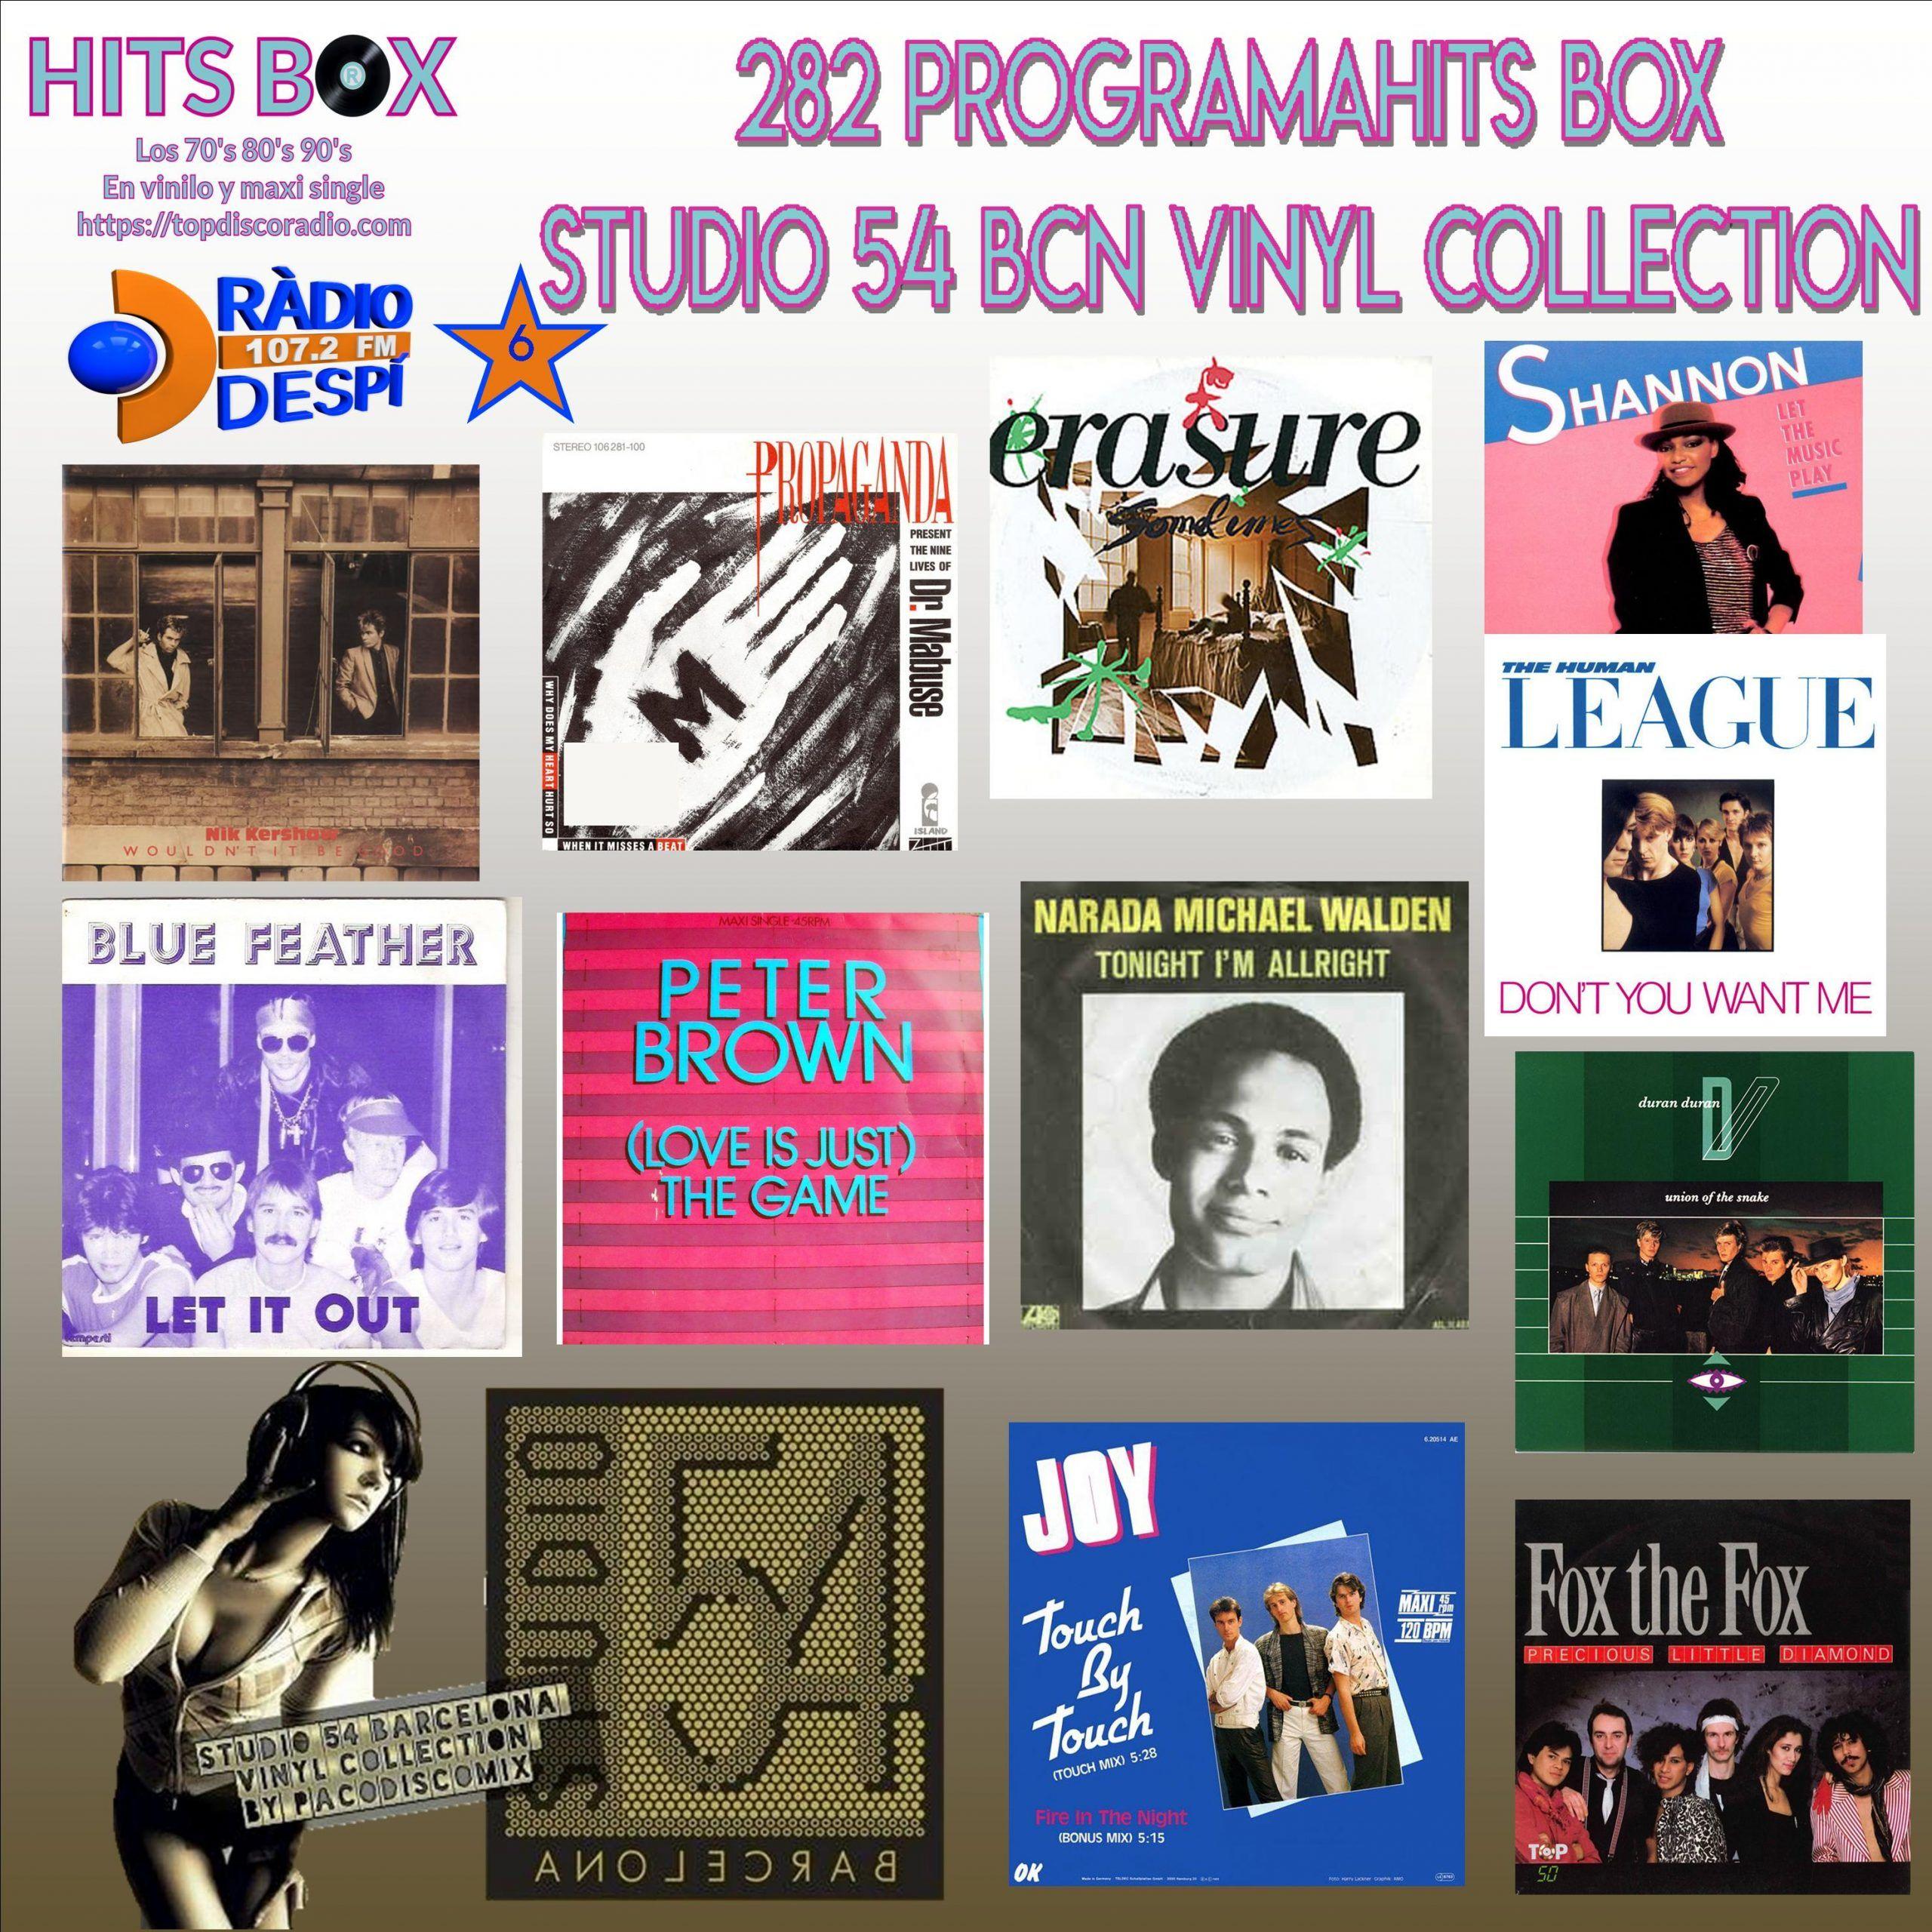 282 Programa Hits Box - Studio 54 Barcelona Vinyl Collection - Topdisco Radio - Dj Xavi Tobaja